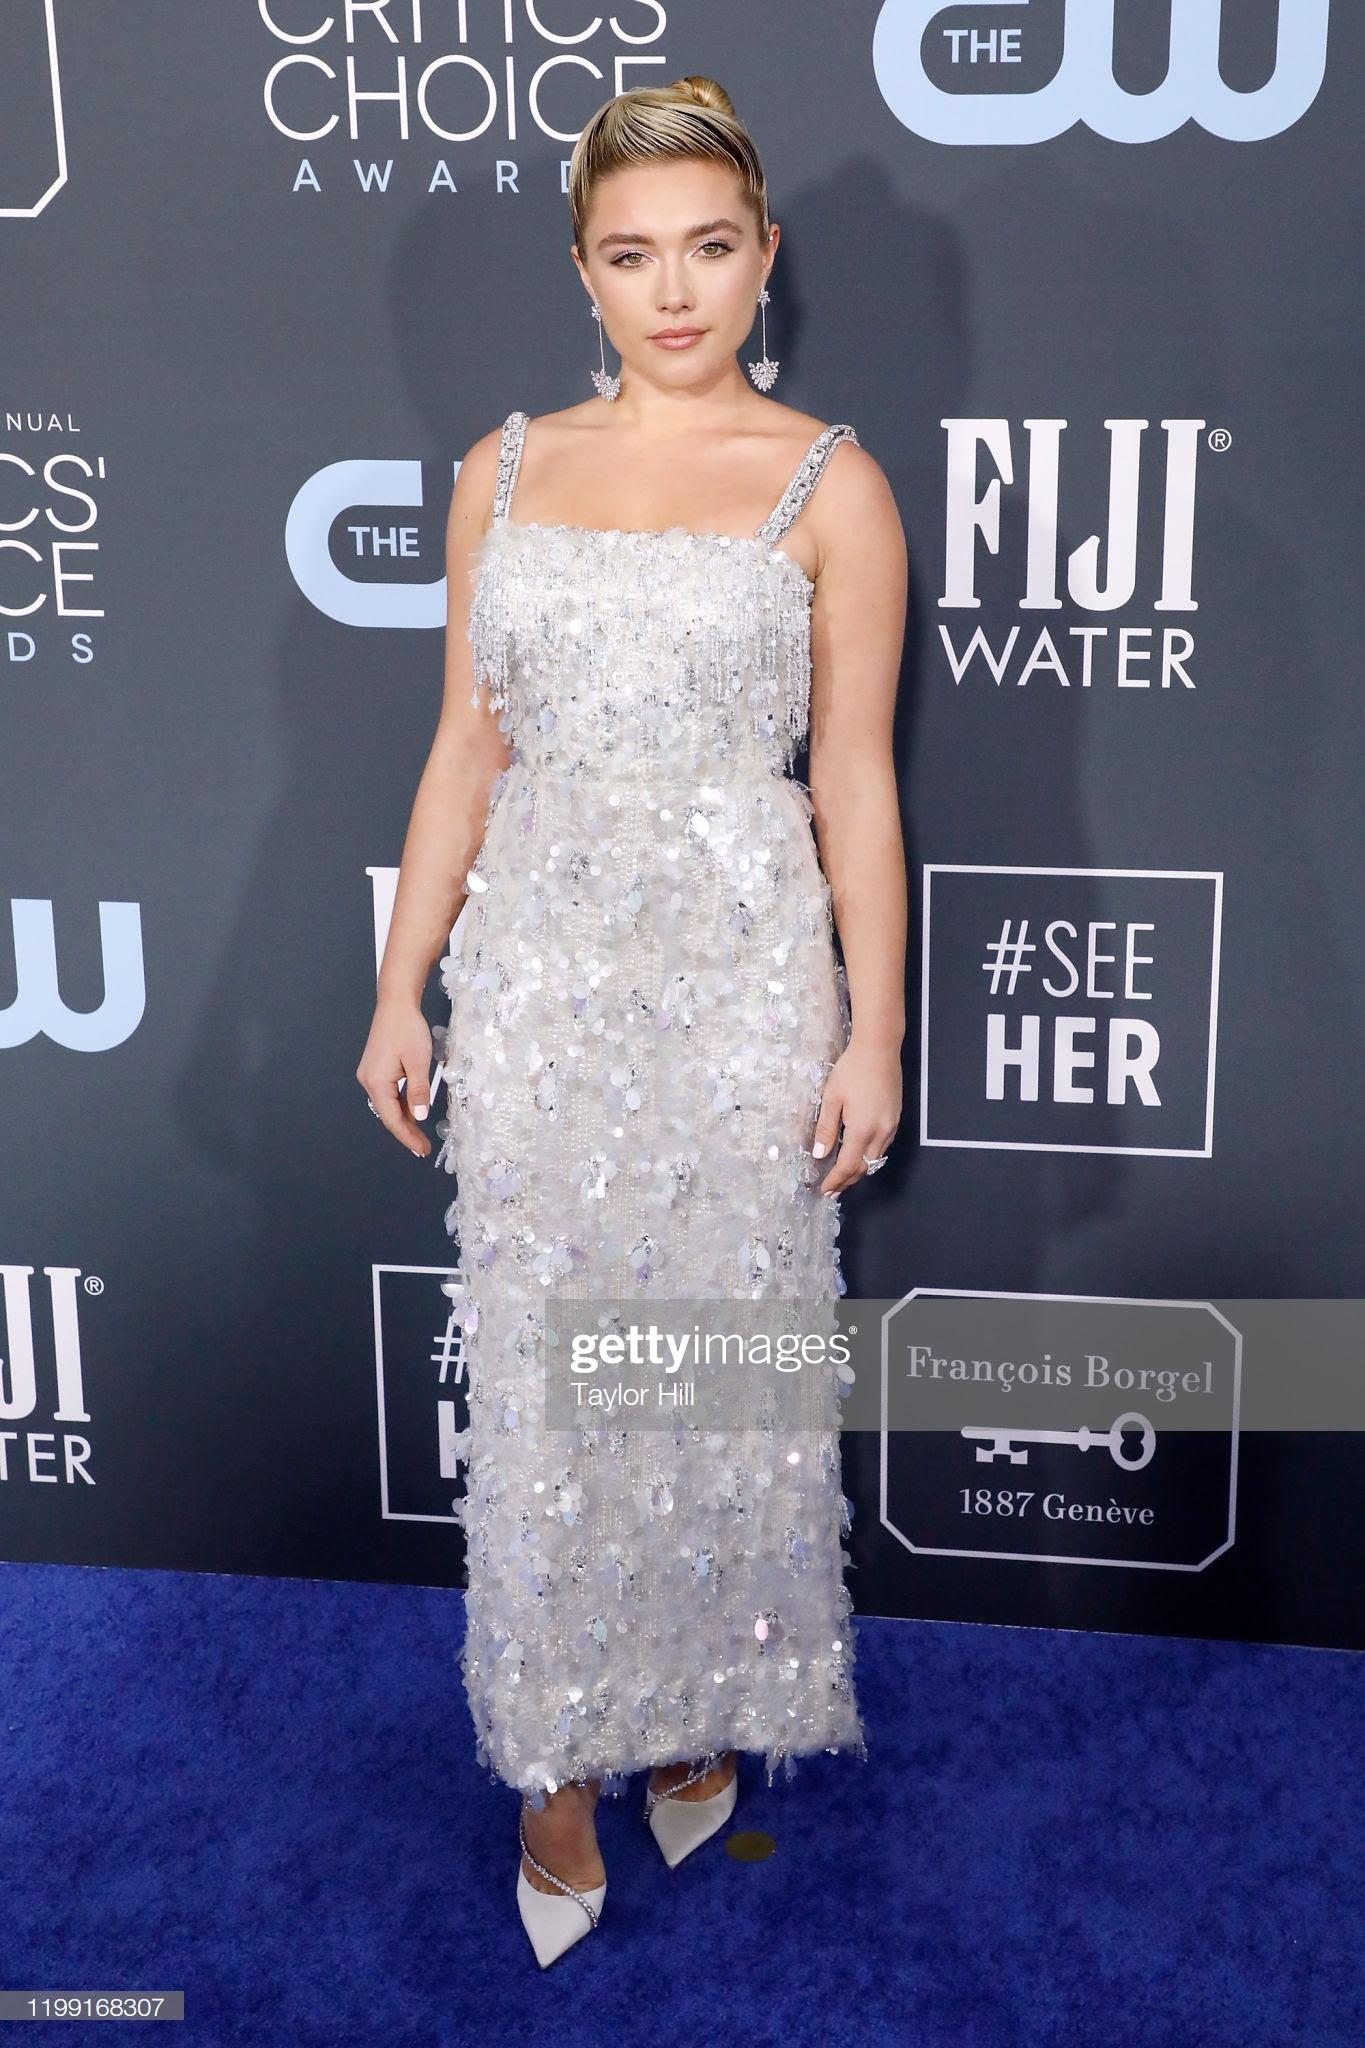 e7606559 a586 459a 9920 197490386518 - Jennifer Lopez y Emily,entre las celebrities que apostaron por Jimmy Choo en los Critics' Choice Awards